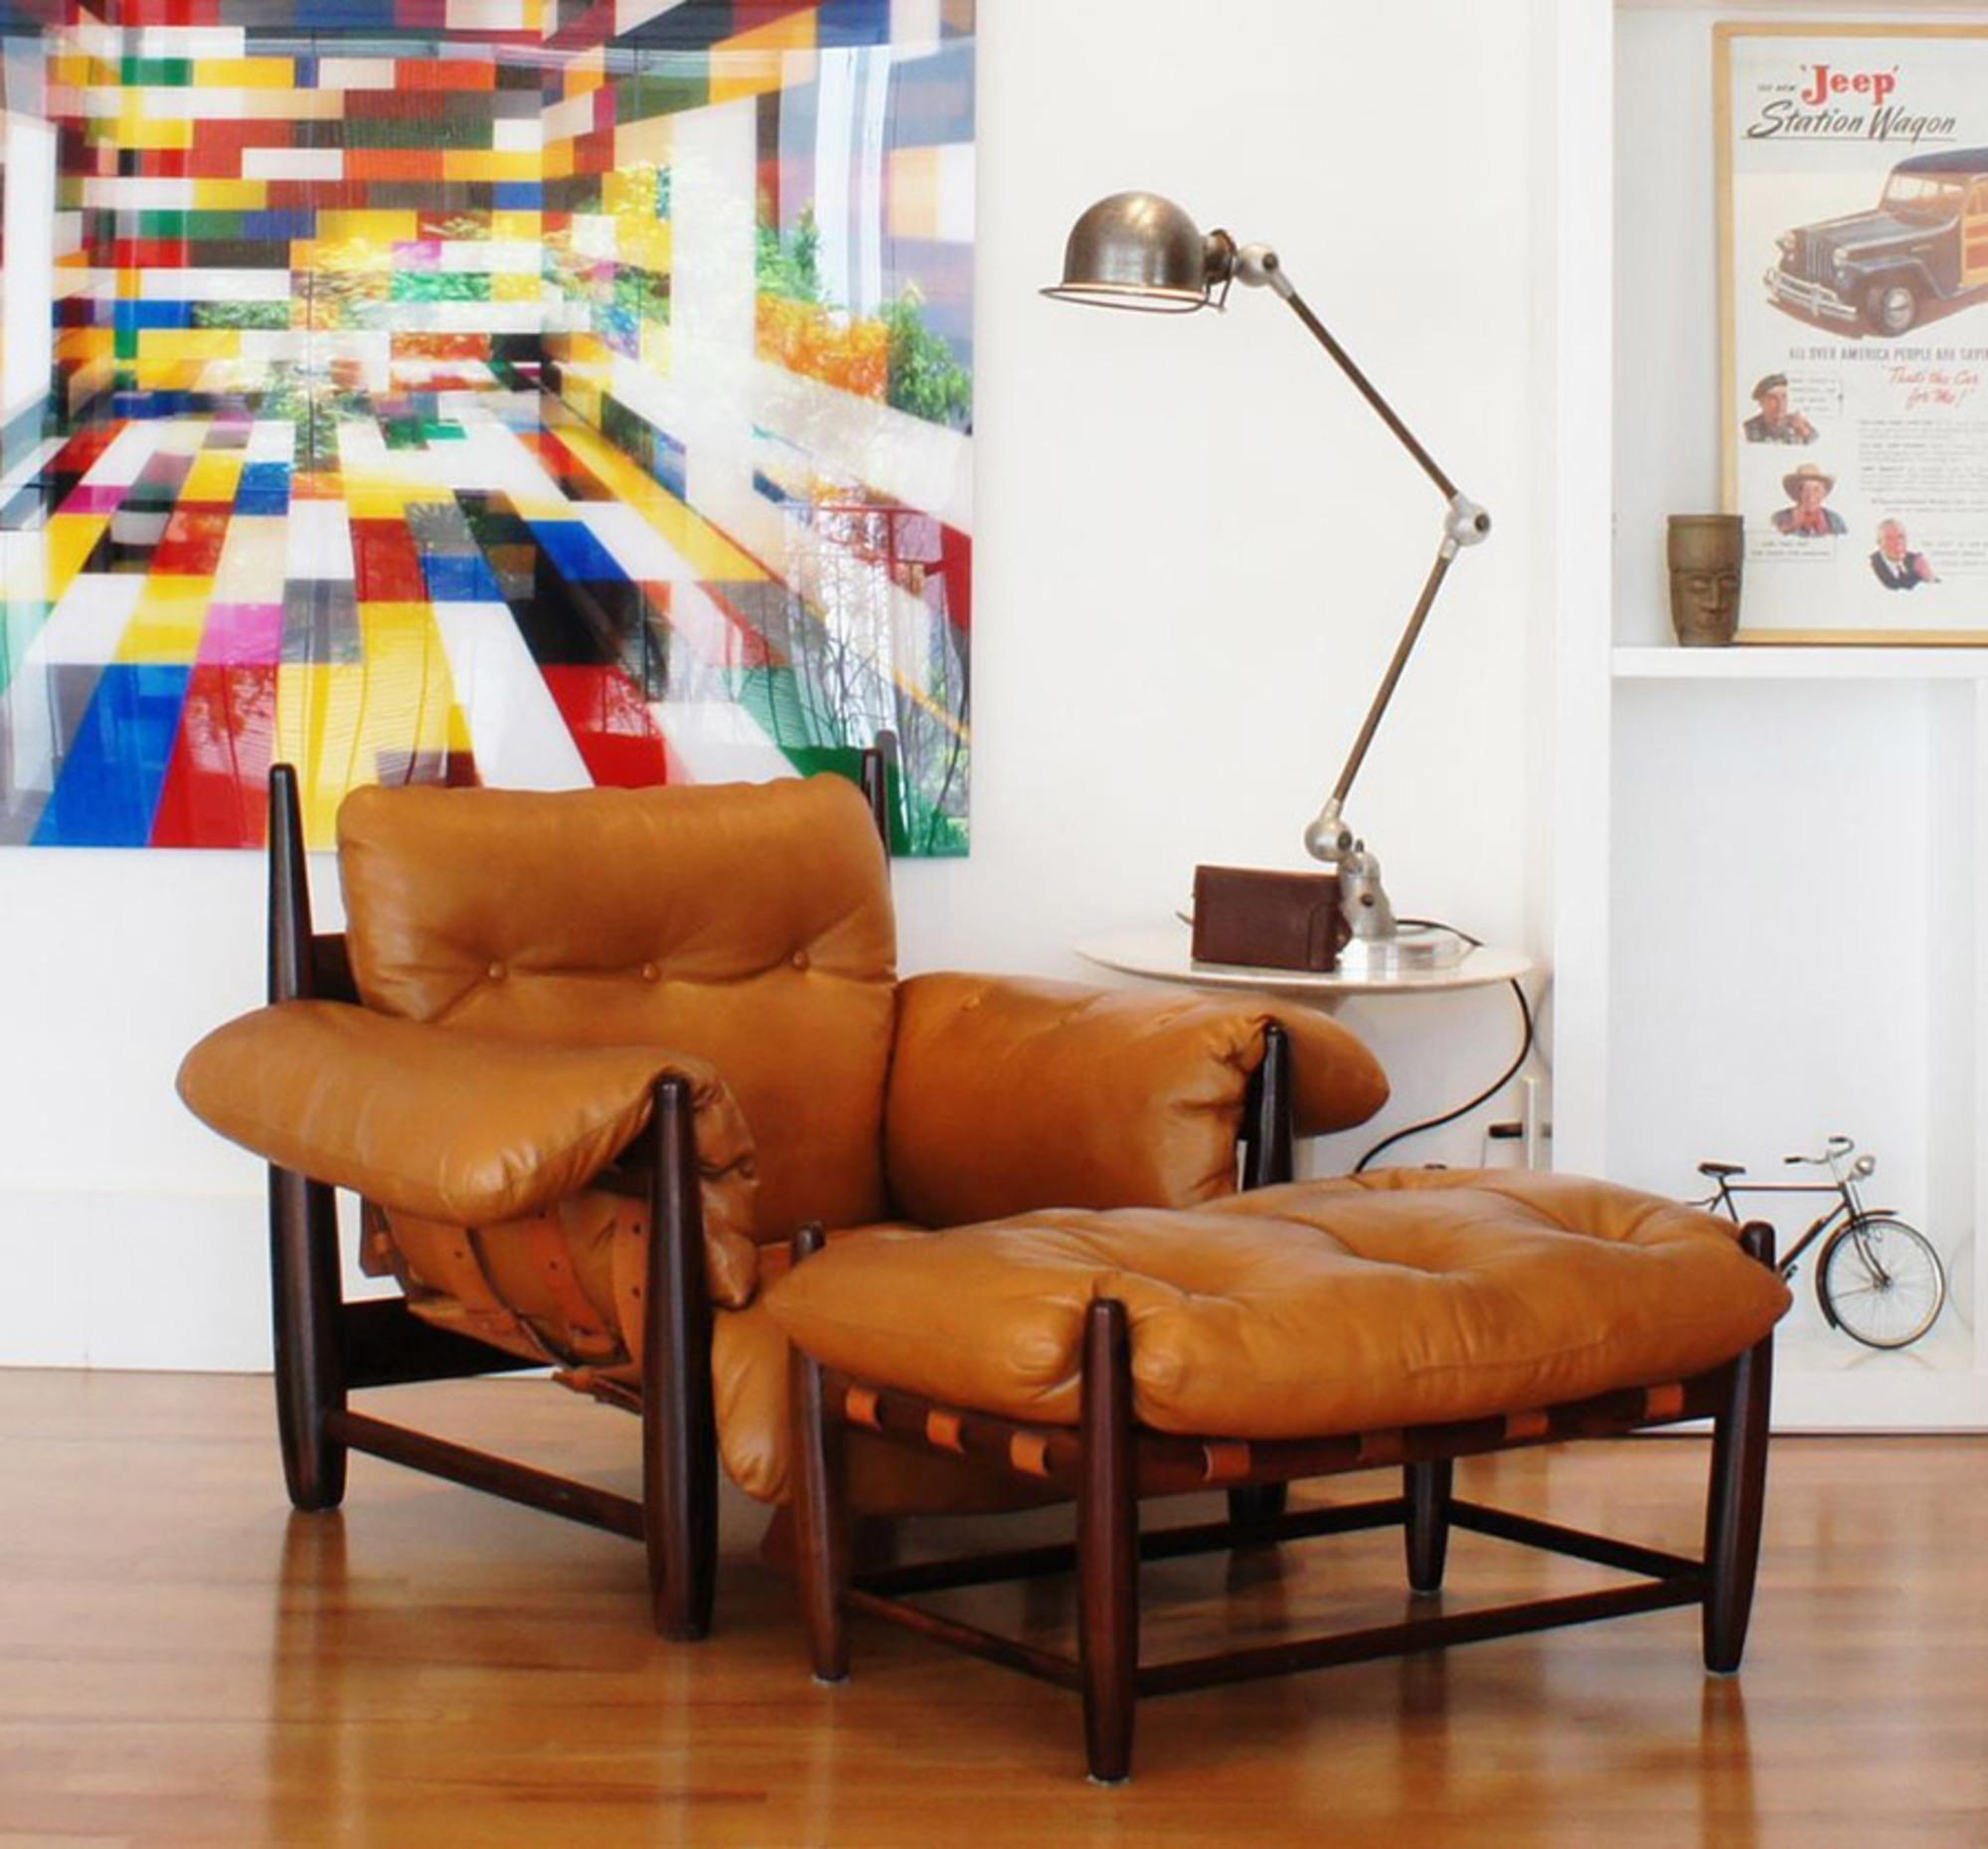 6688-sala-de-estar-projetos-diversos-residenciais-ii-gabriela-marques-viva-decora